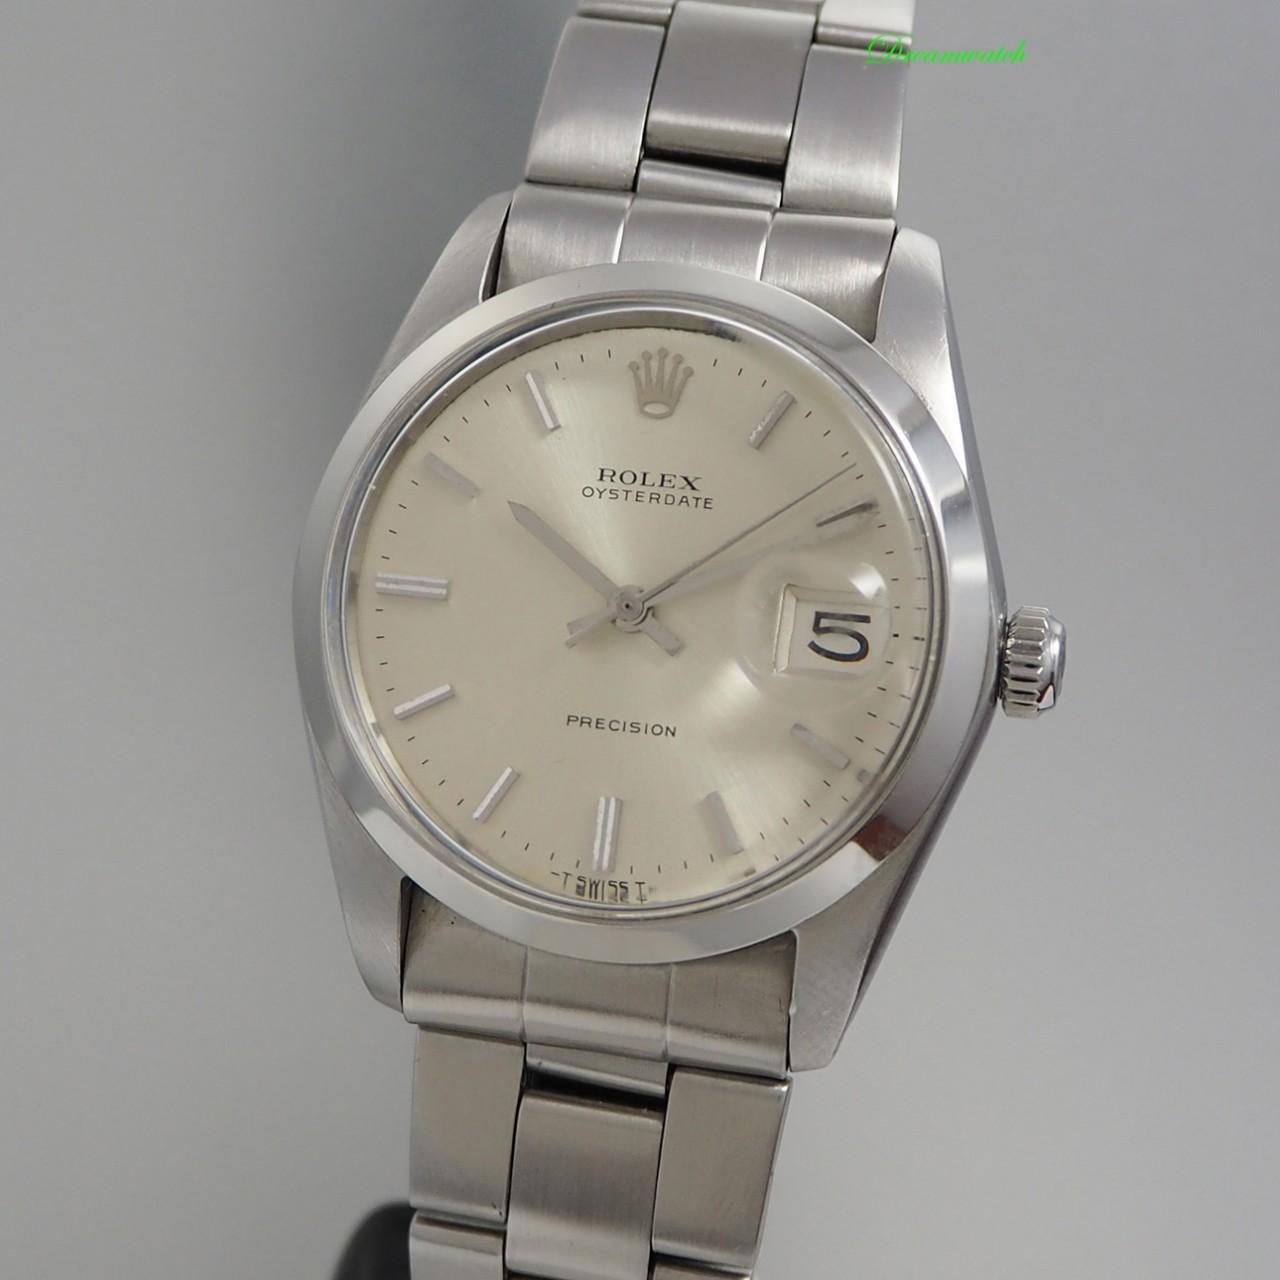 Rolex Oyster Date Precision 6694 -Stahl/Stahl Handaufzug